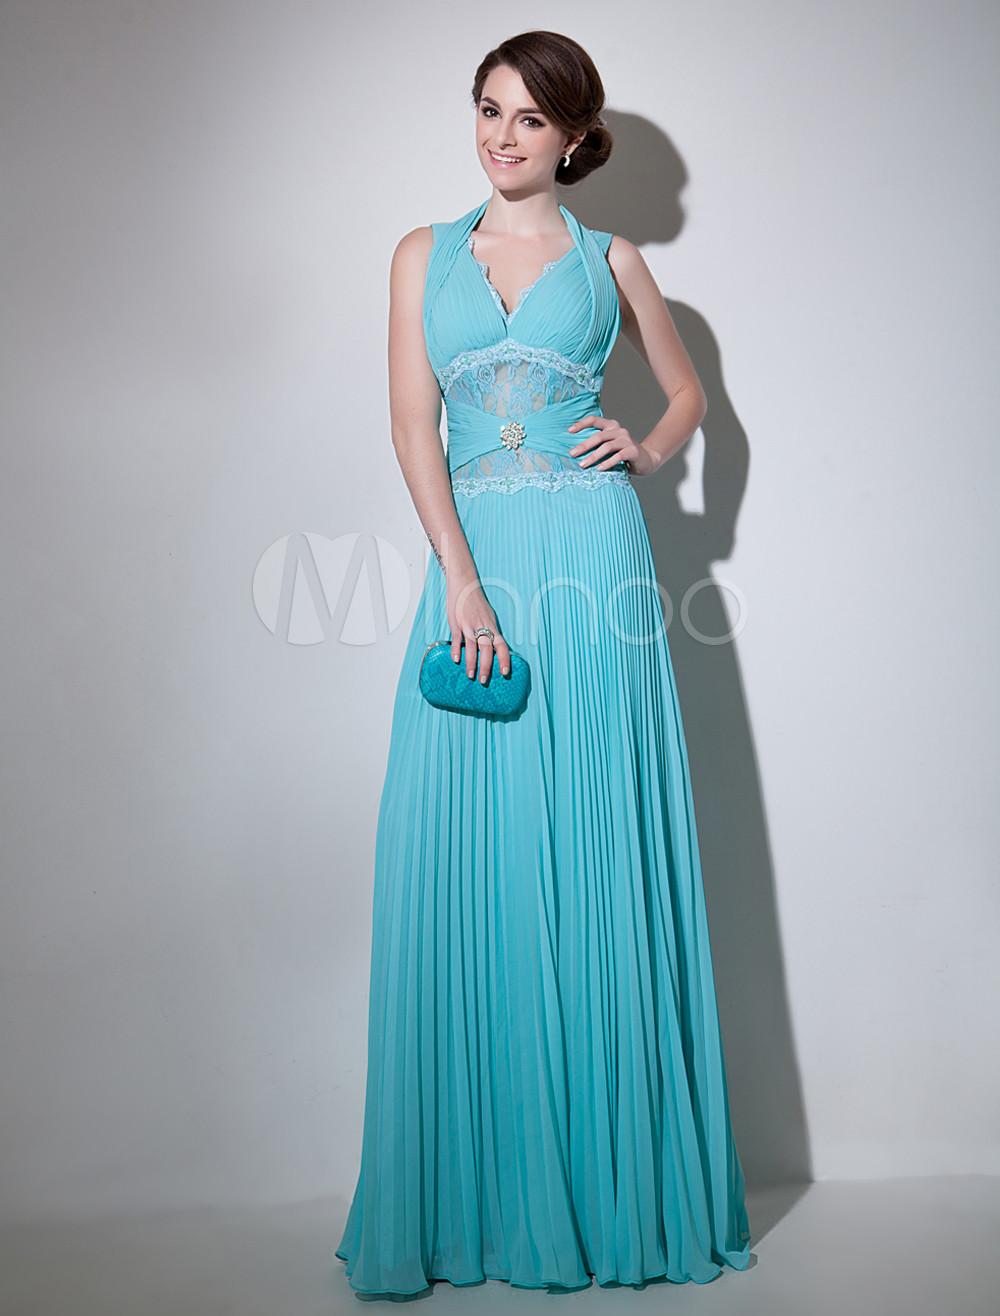 Grace Blue V-Neck Beading A-line Sleeveless Chiffon Evening Dress Milanoo (Wedding Evening Dresses) photo